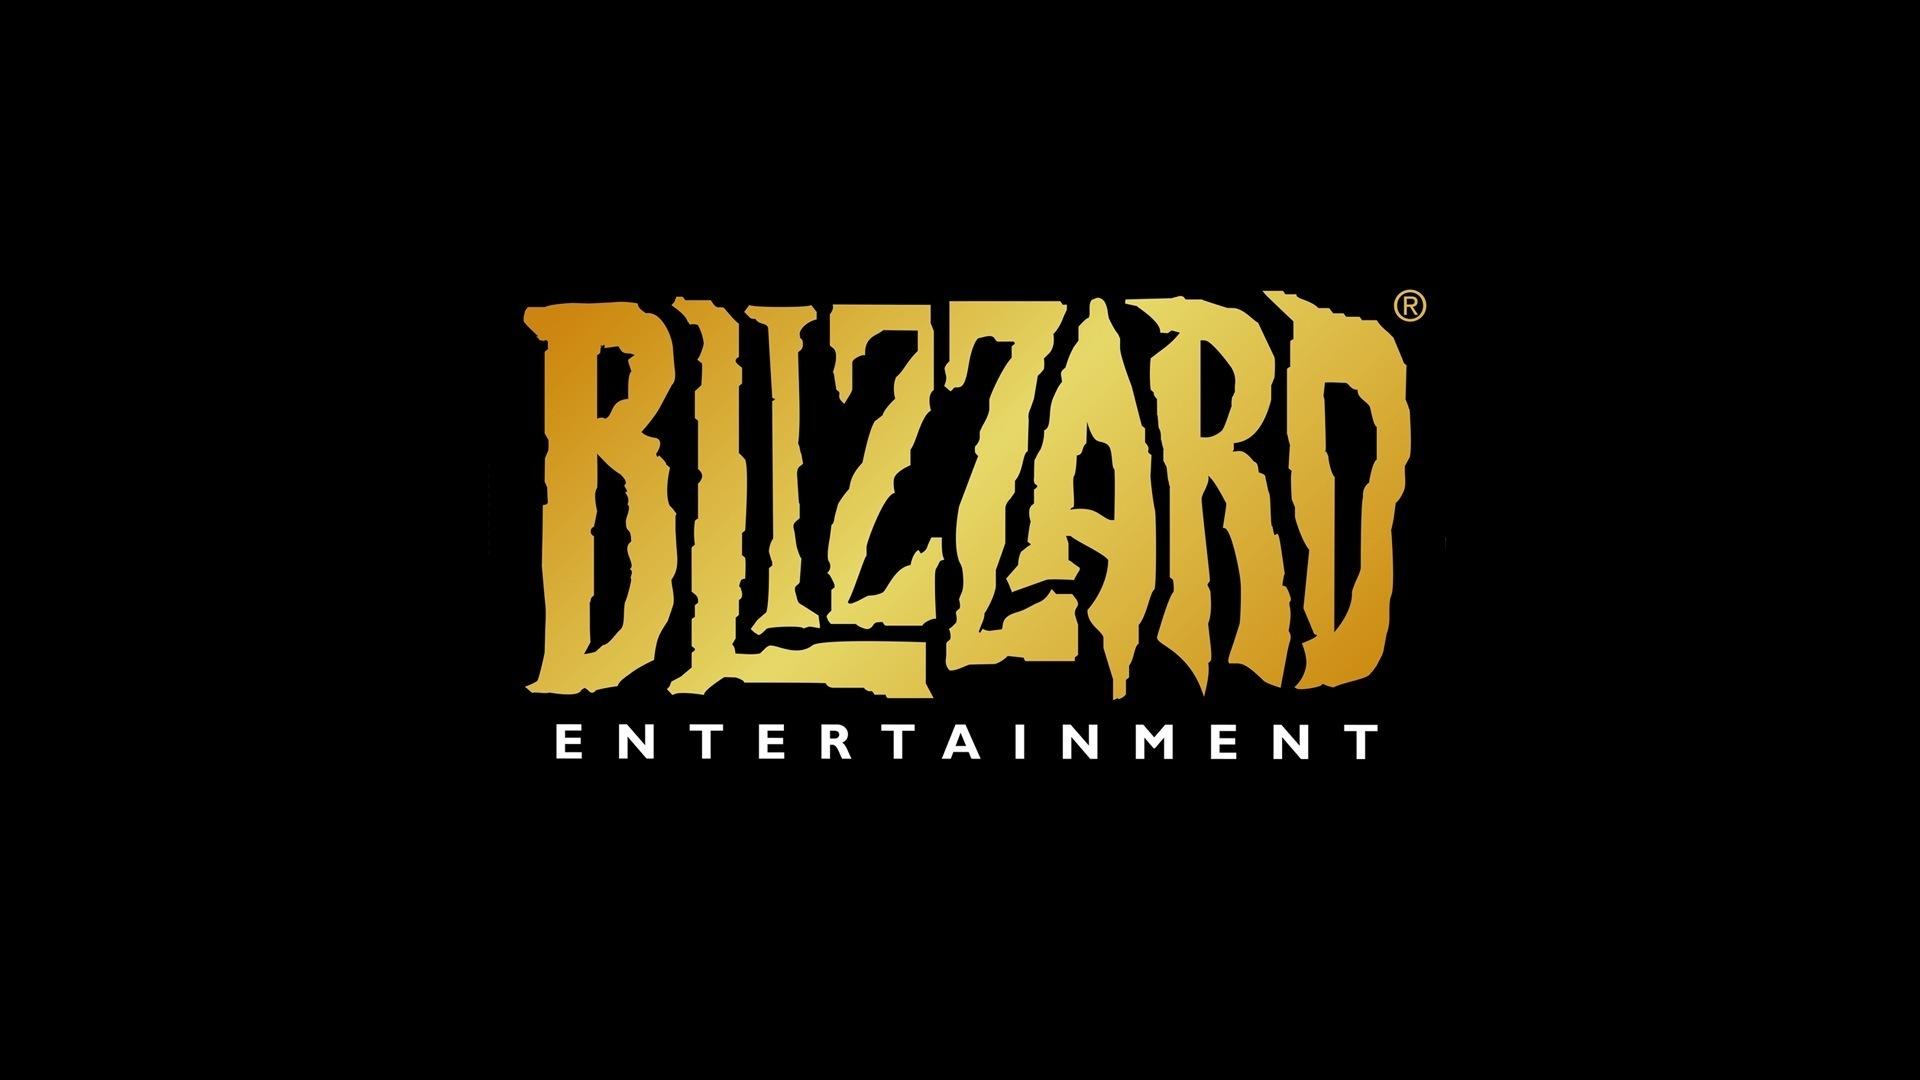 Desktop blizzard entertainment developers Blizzard Wallpapers HD 1920x1080